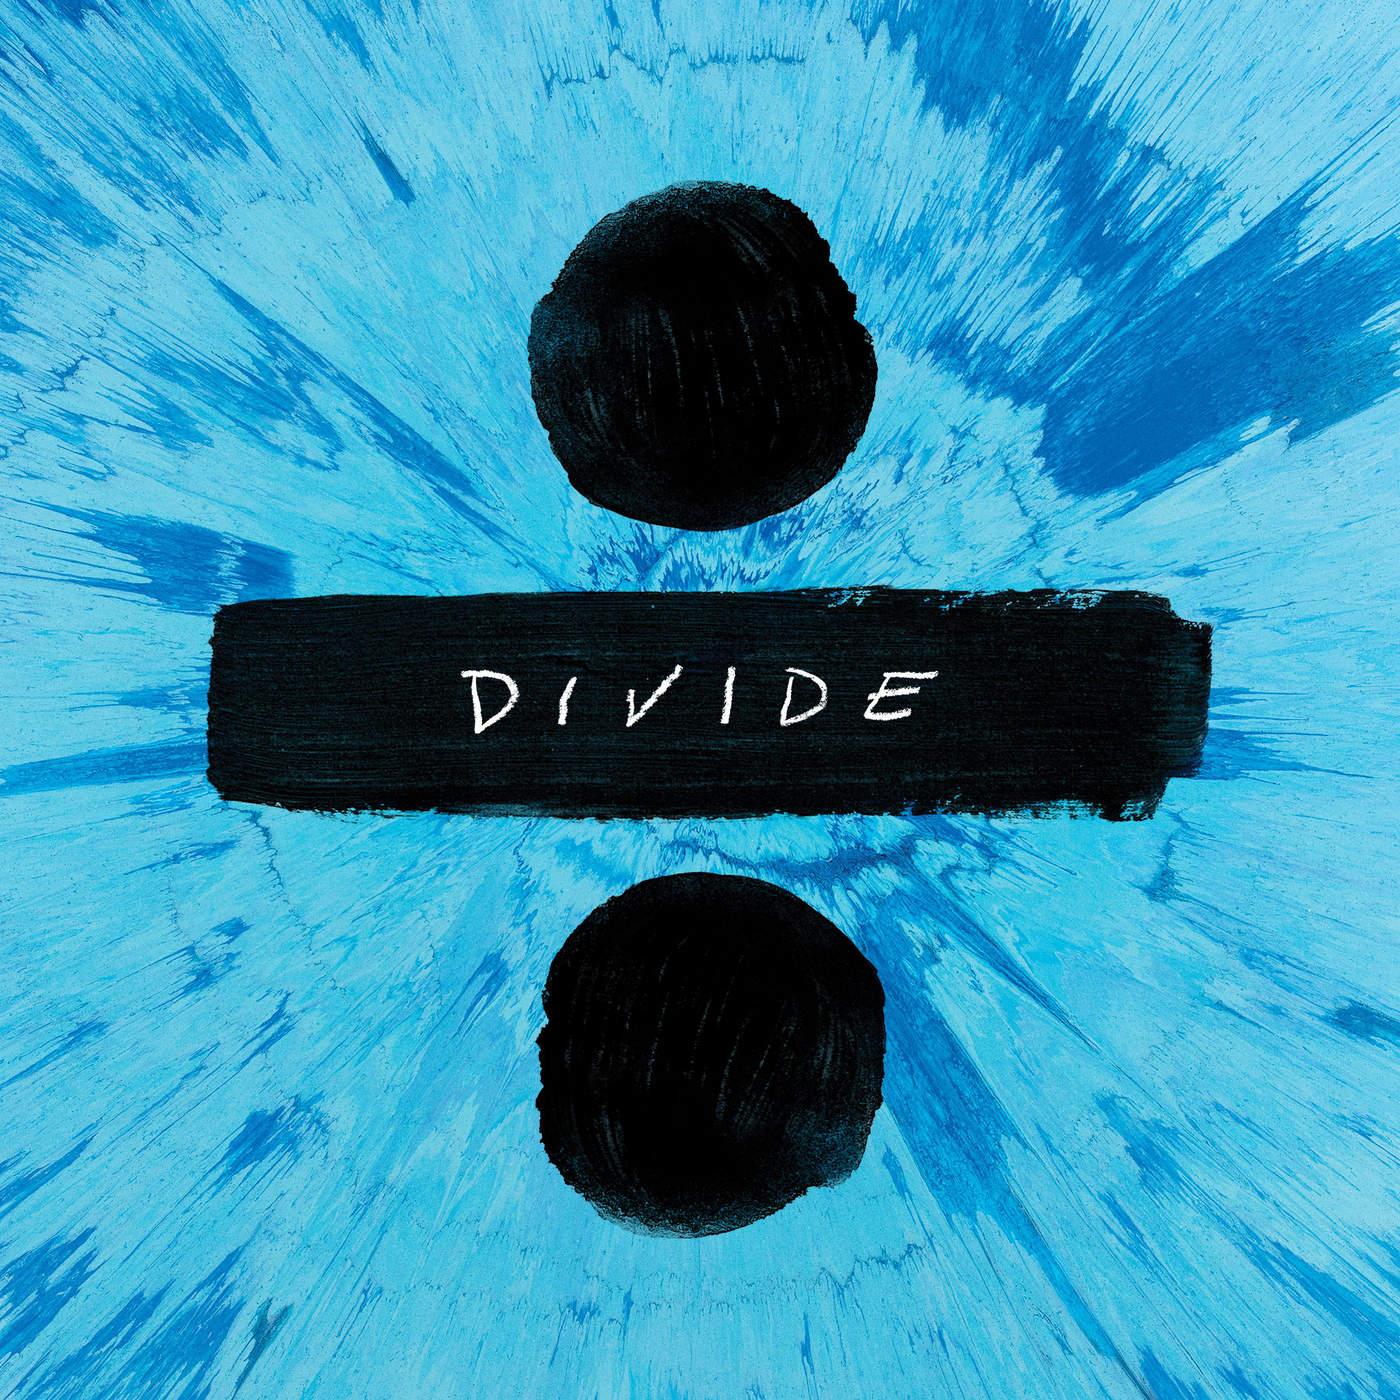 Ed Sheeran - ÷ divide (Deluxe) - Album (2017) [iTunes Plus AAC M4A]